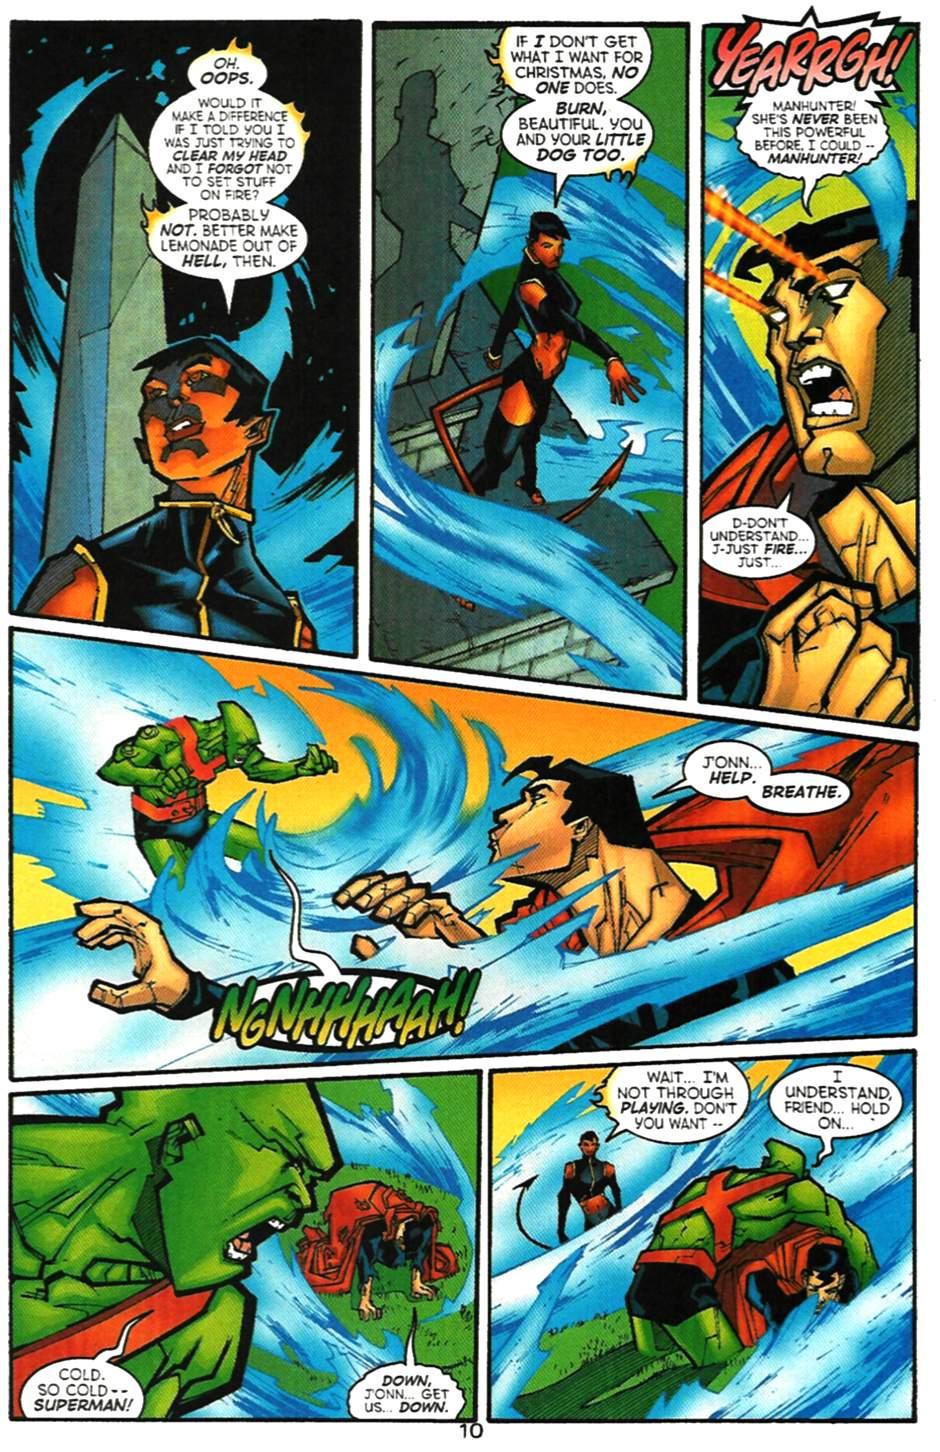 Action Comics (1938) 774 Page 10